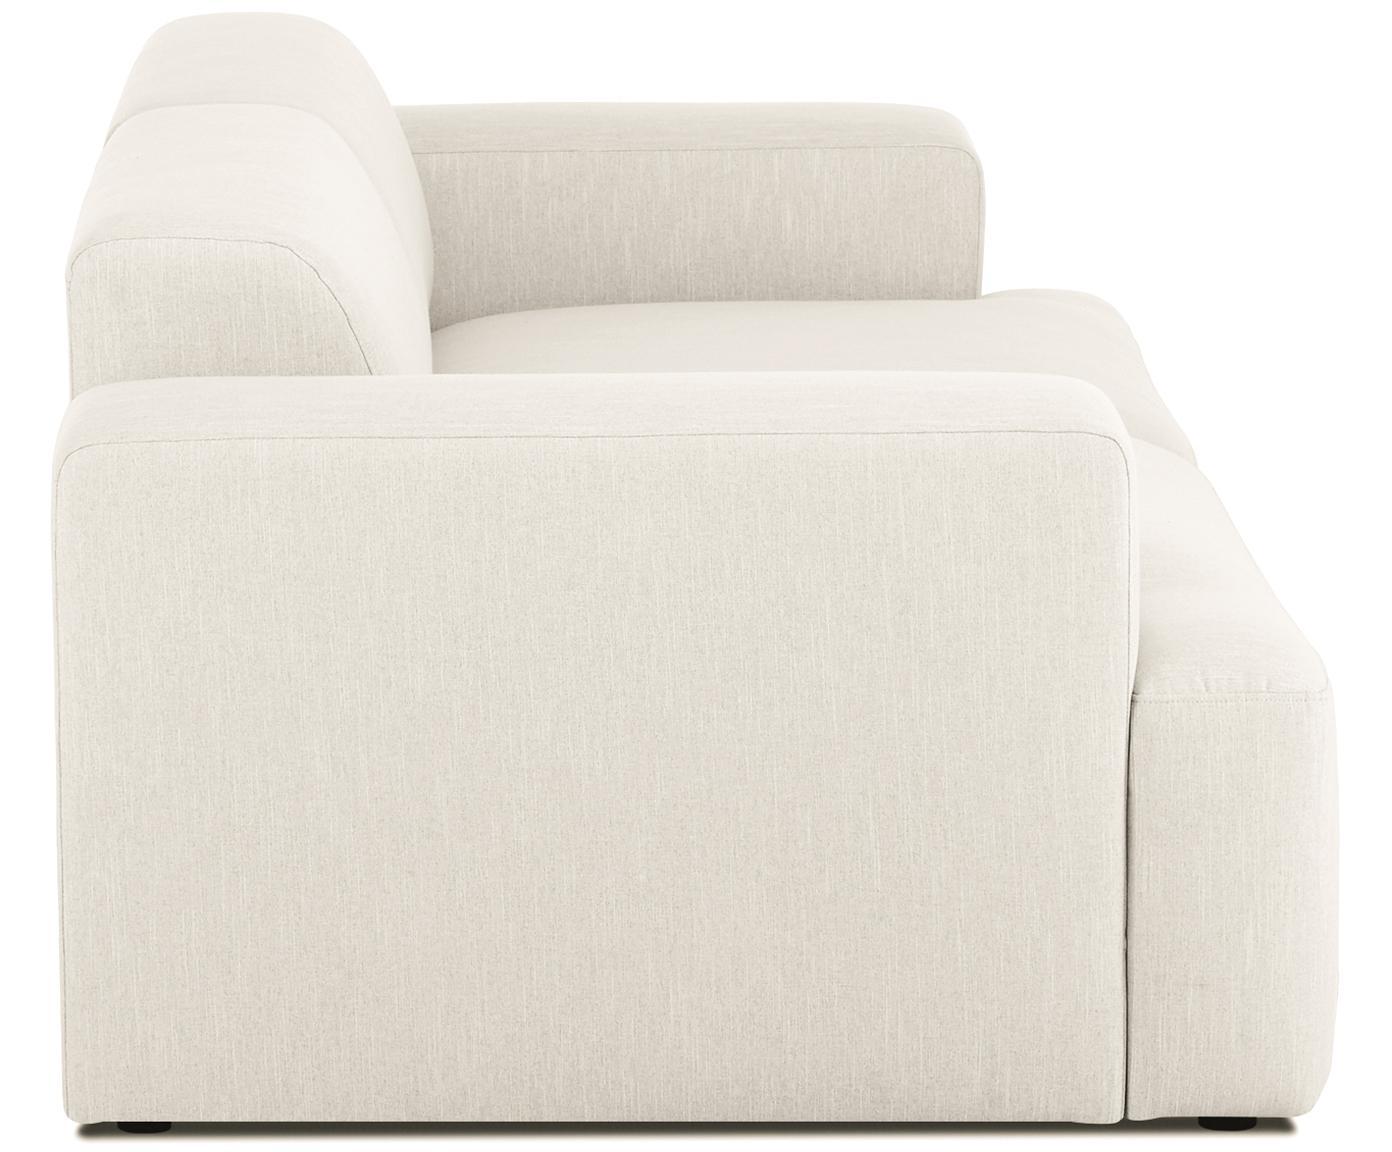 Sofa Melva (3-Sitzer), Bezug: Polyester 35.000 Scheuert, Gestell: Massives Kiefernholz, Spa, Füße: Kiefernholz, Webstoff Beige, B 240 x T 101 cm